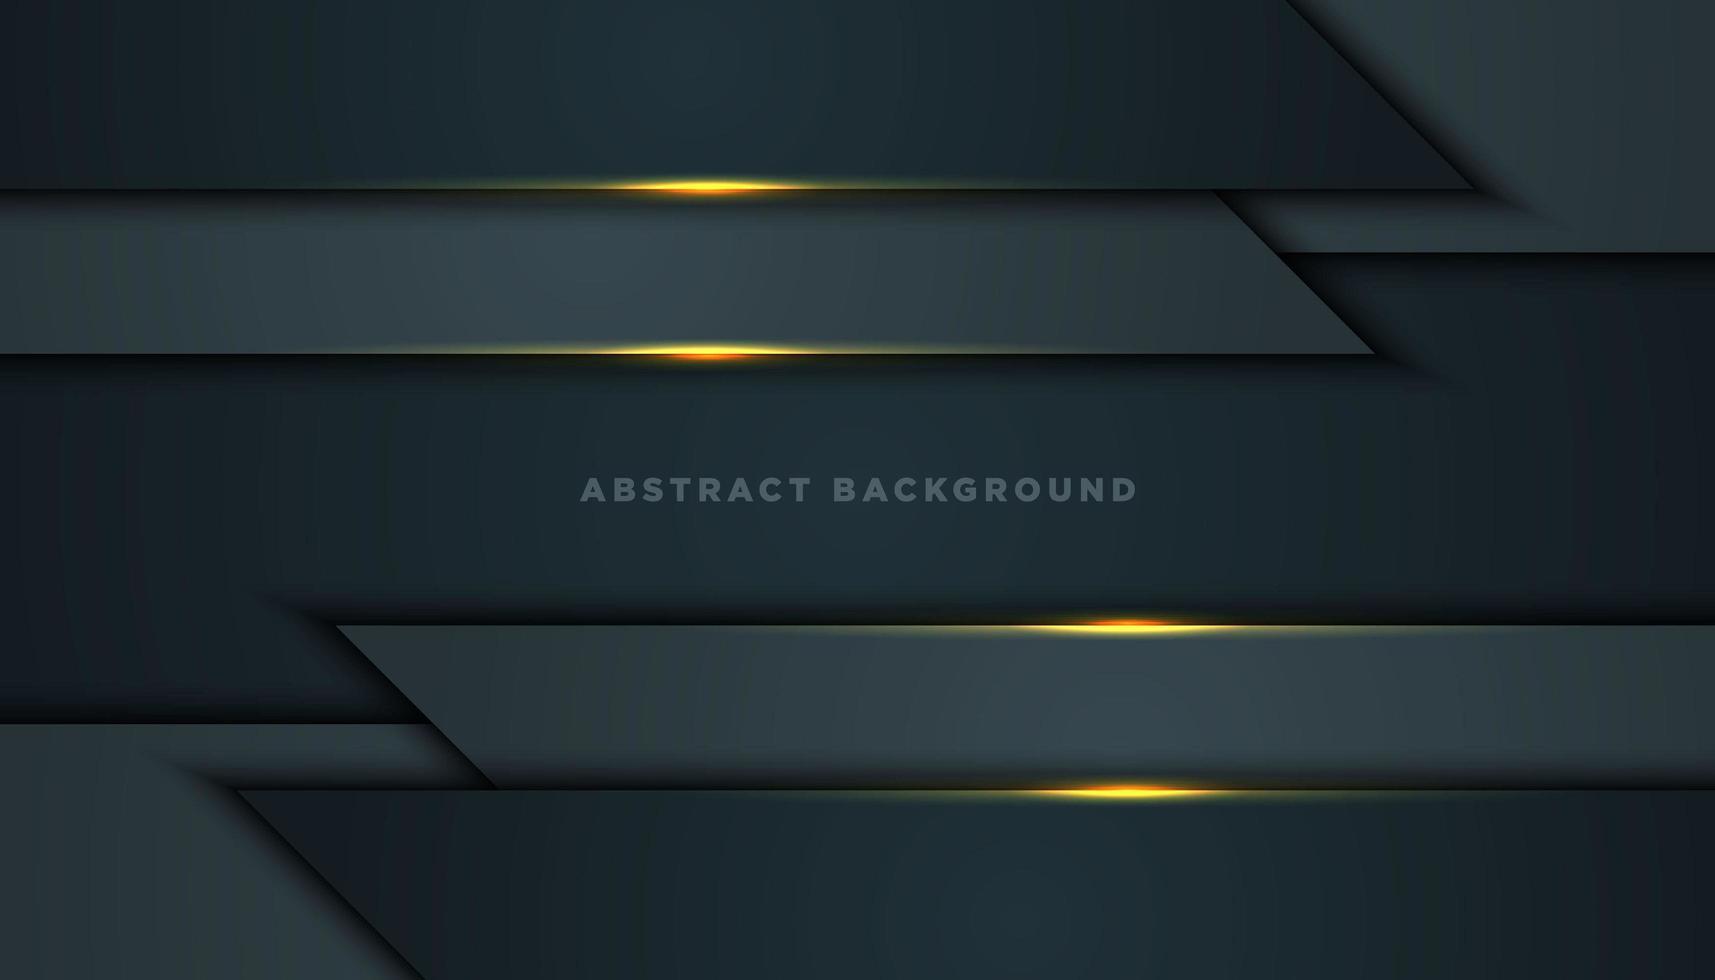 grå bakgrund med horisontella lager på topp och botten vektor